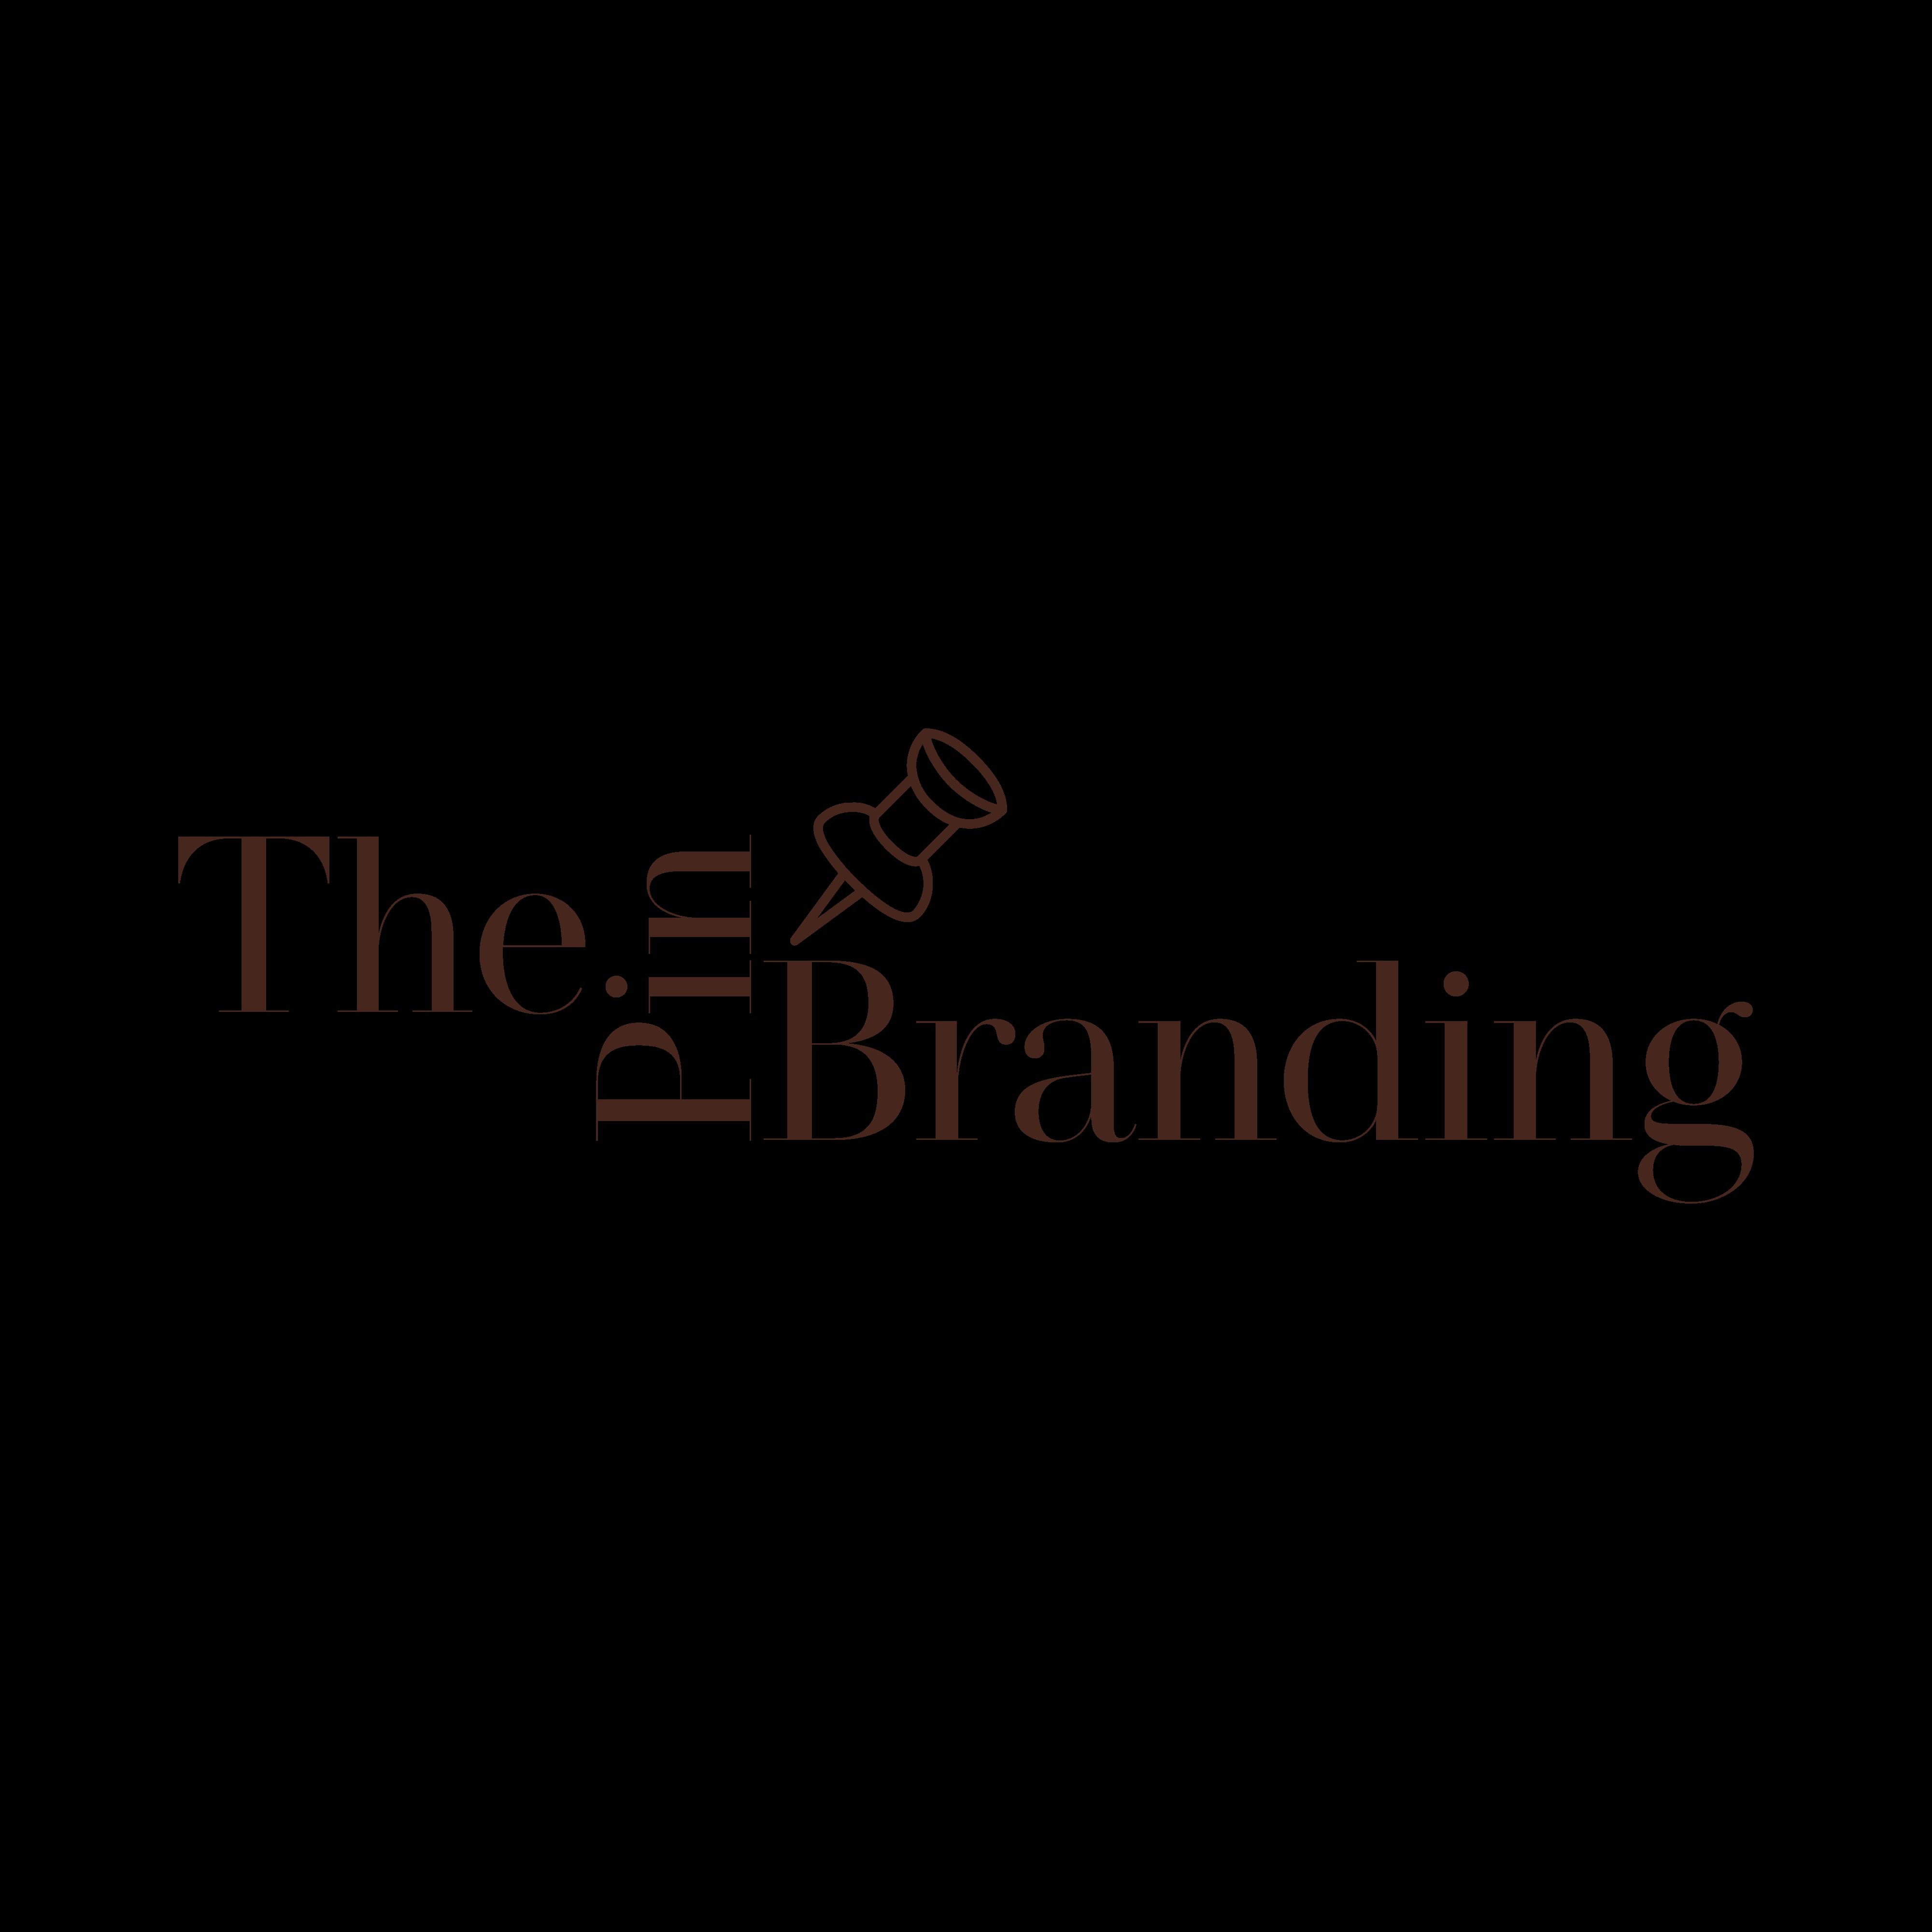 The Pin Branding